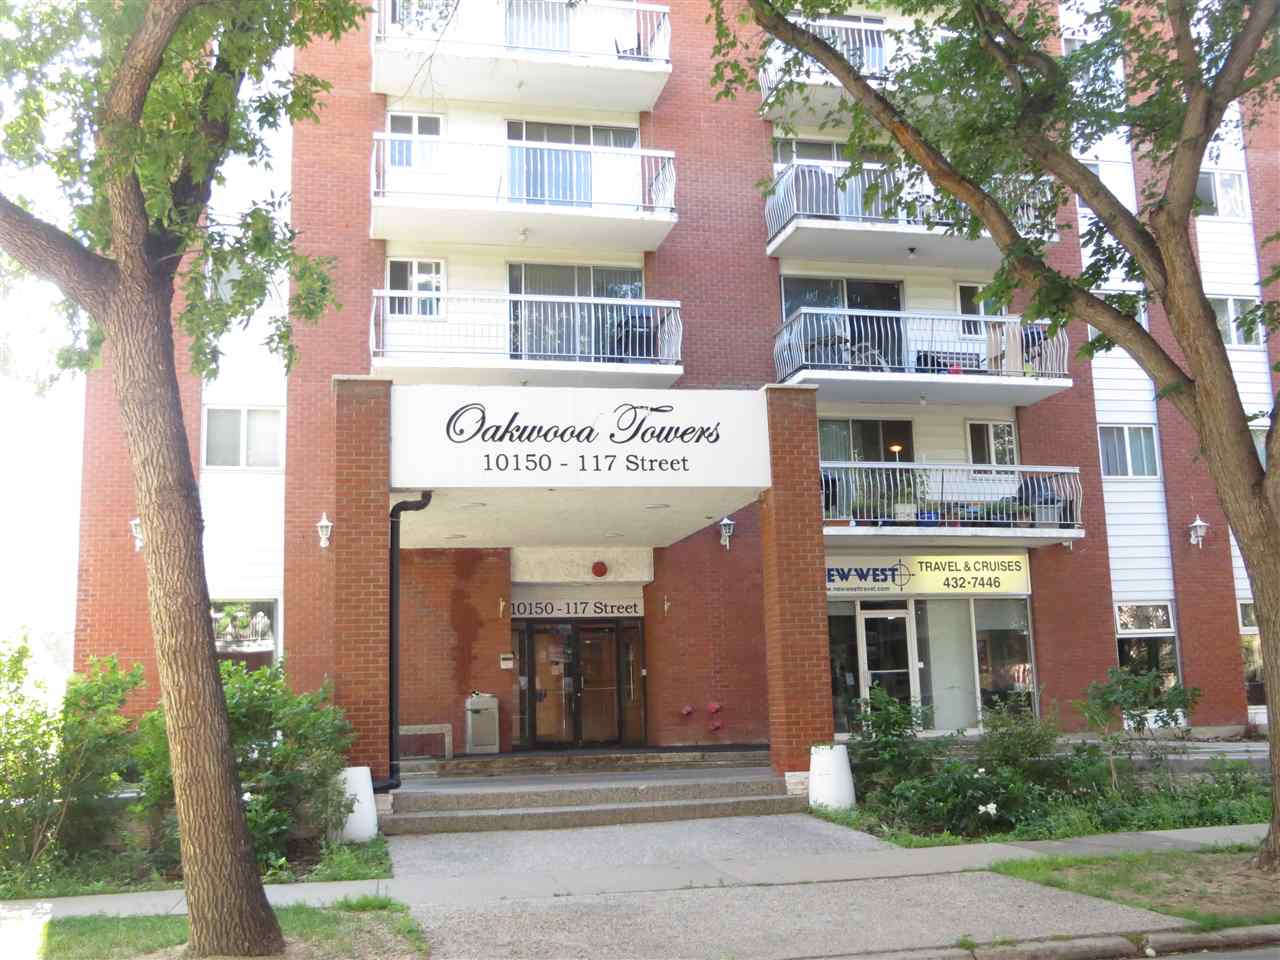 For Sale: 402 - 10150 117 Street, Edmonton, AB | 1 Bed, 1 Bath Condo for $129,900. See 9 photos!